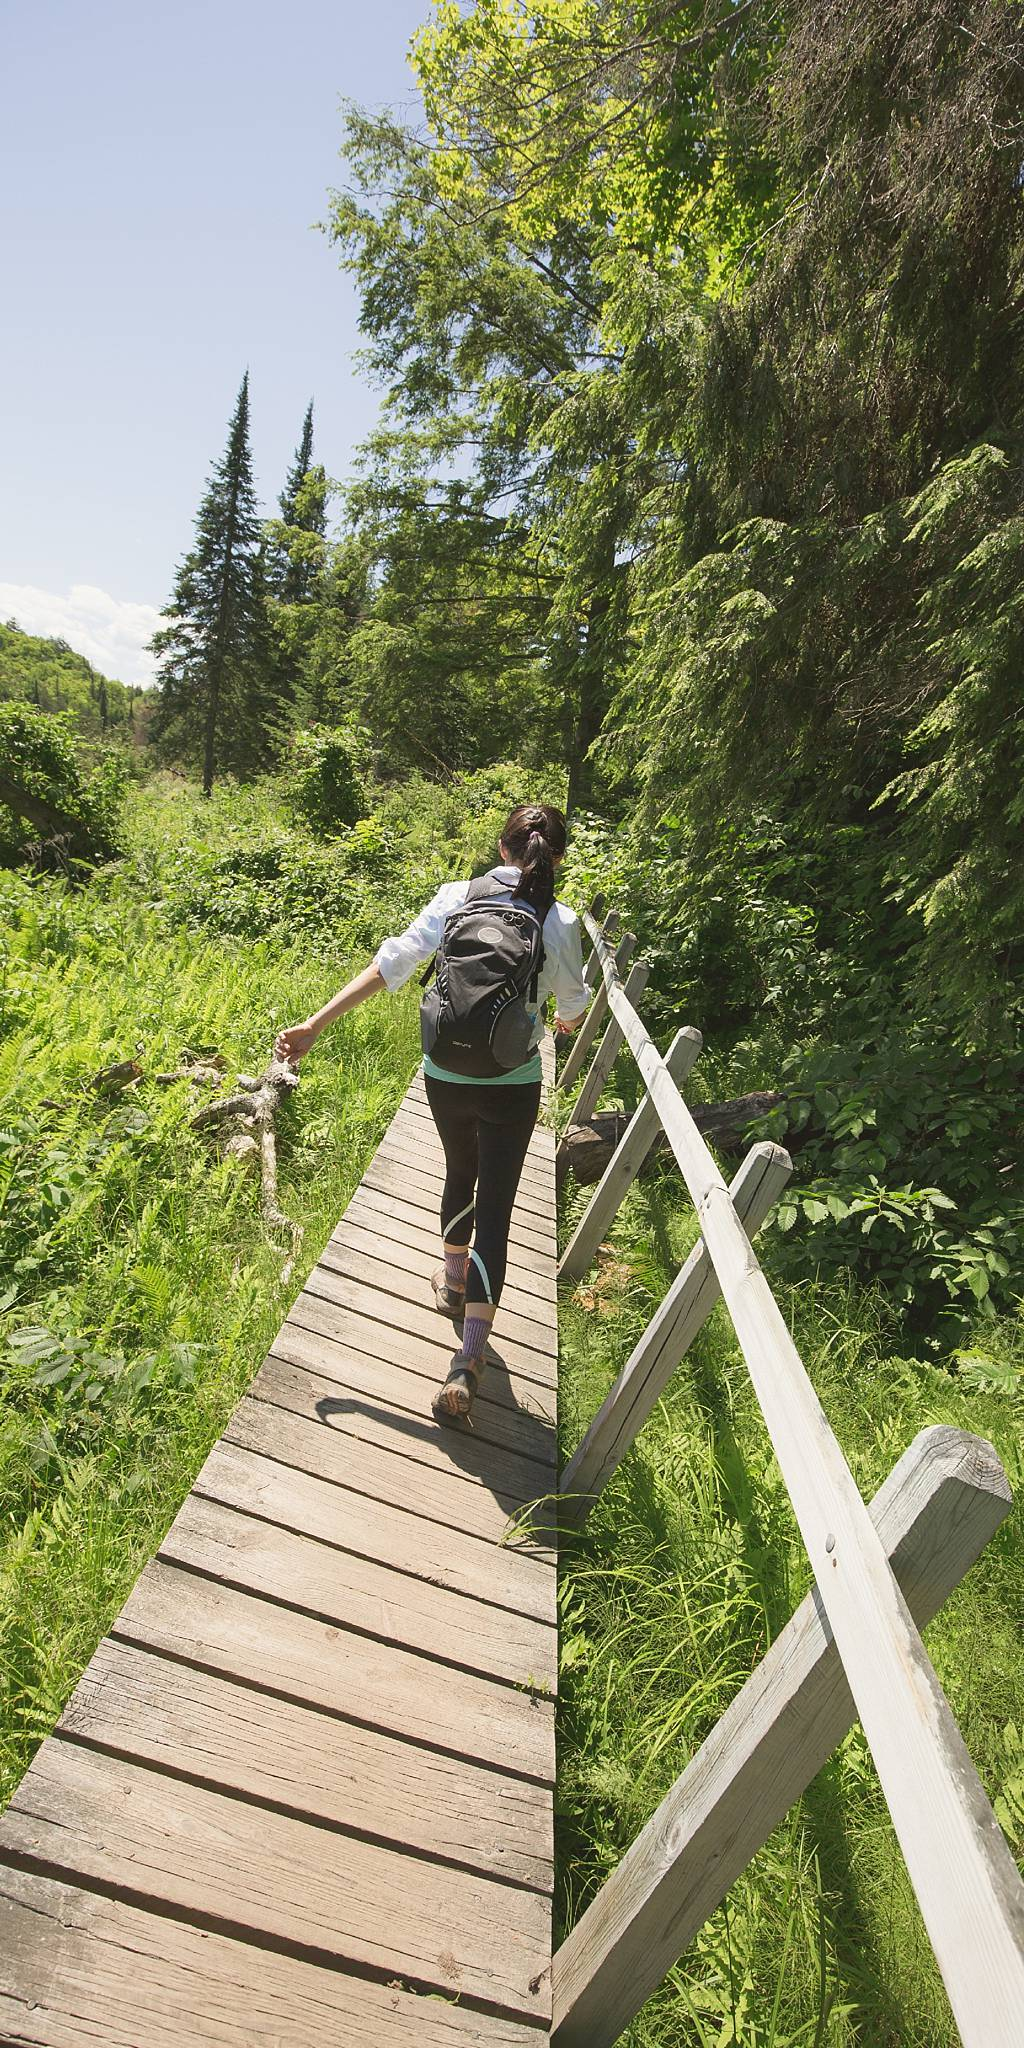 tahquamenon falls michigan Tom Schmidt Photo travel blog